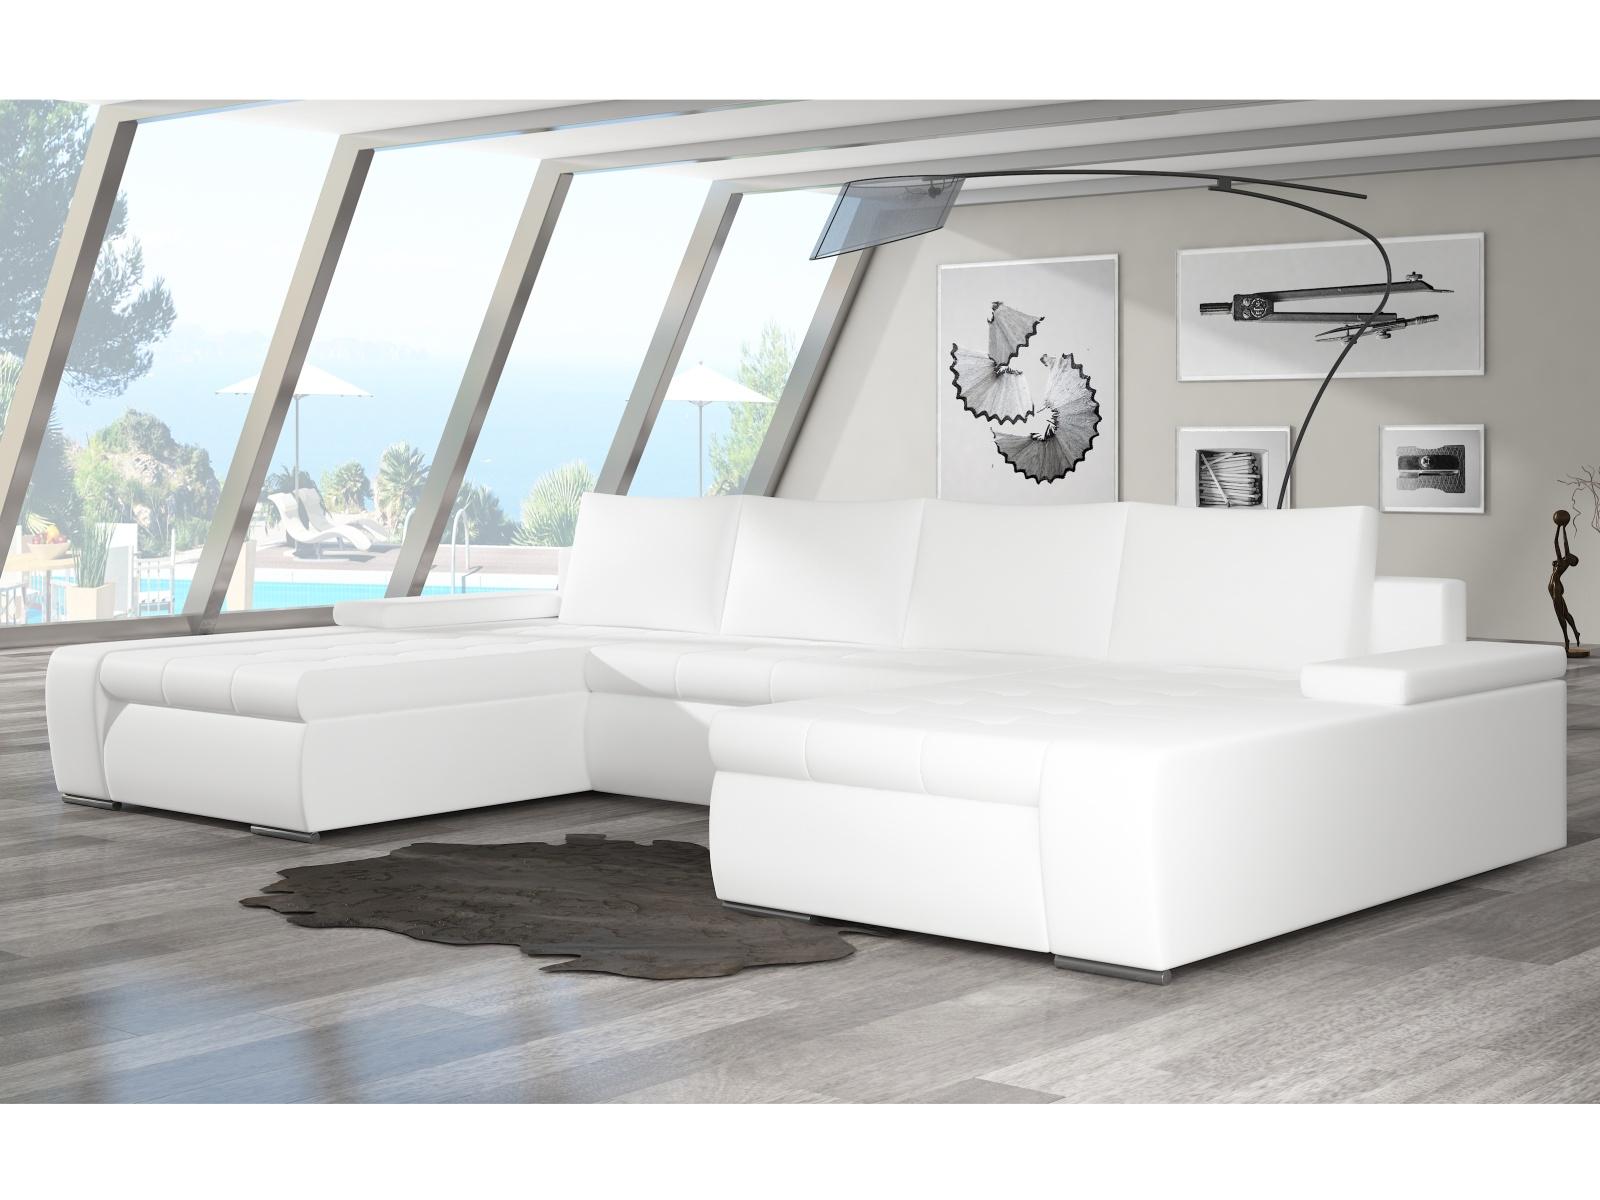 ELTAP Rohová sedačka MARINO 10, bílá ekokůže